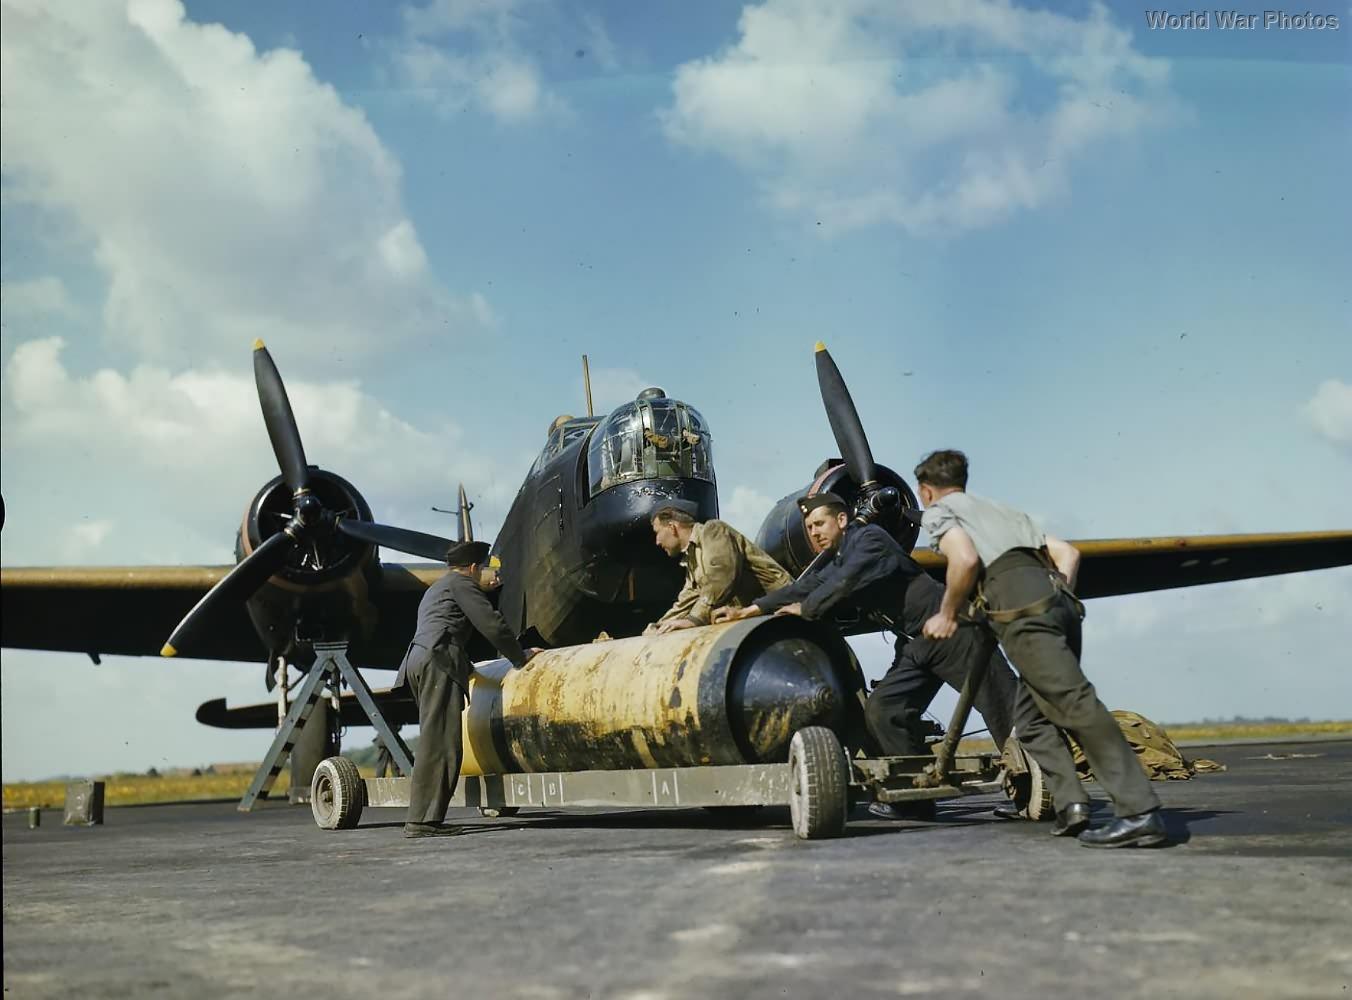 Vickers Wellington of No. 419 Squadron RAF